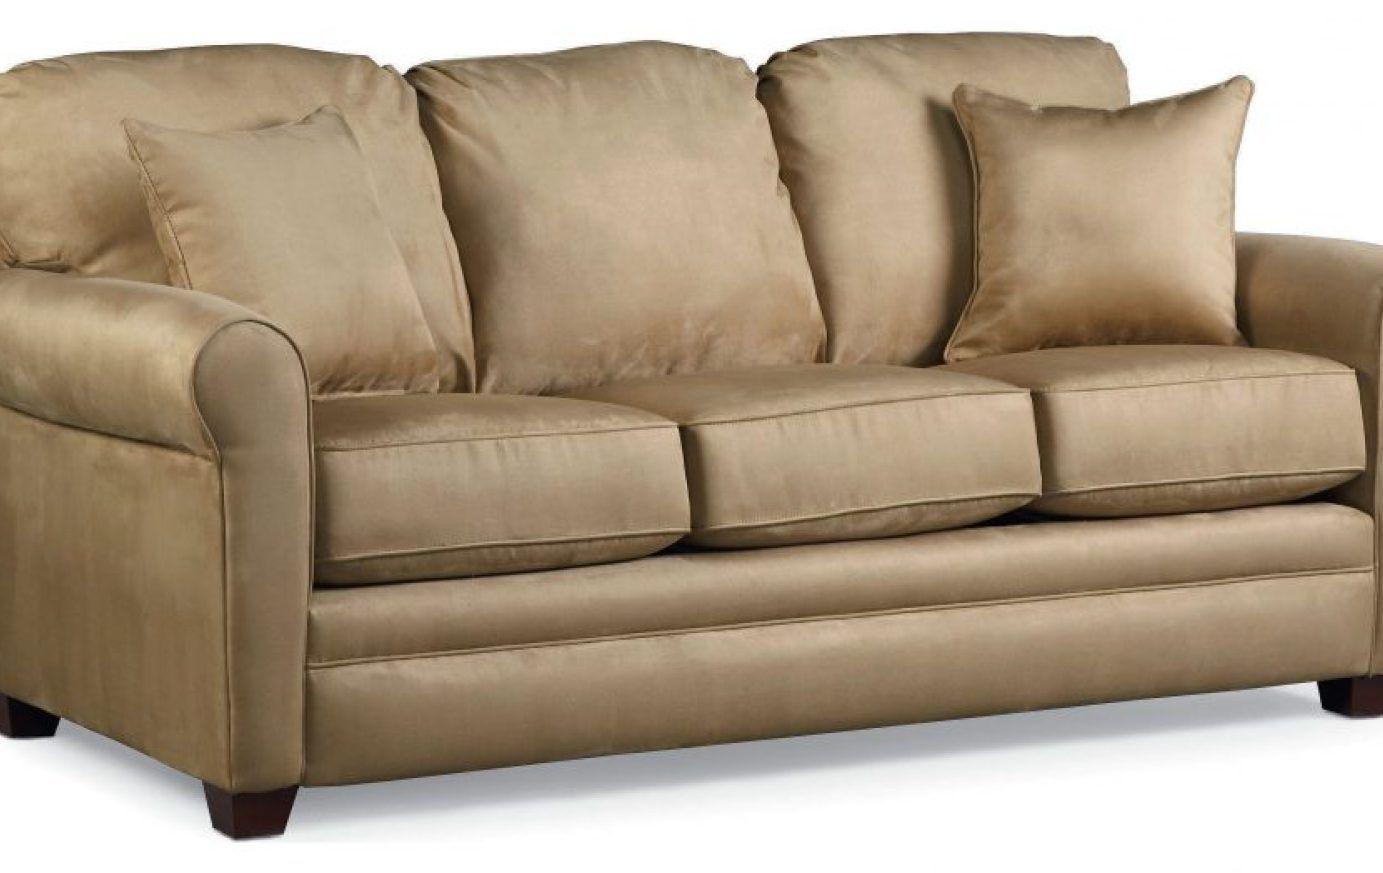 Queen Size Sleeper Sofa Cover Www Energywarden Net